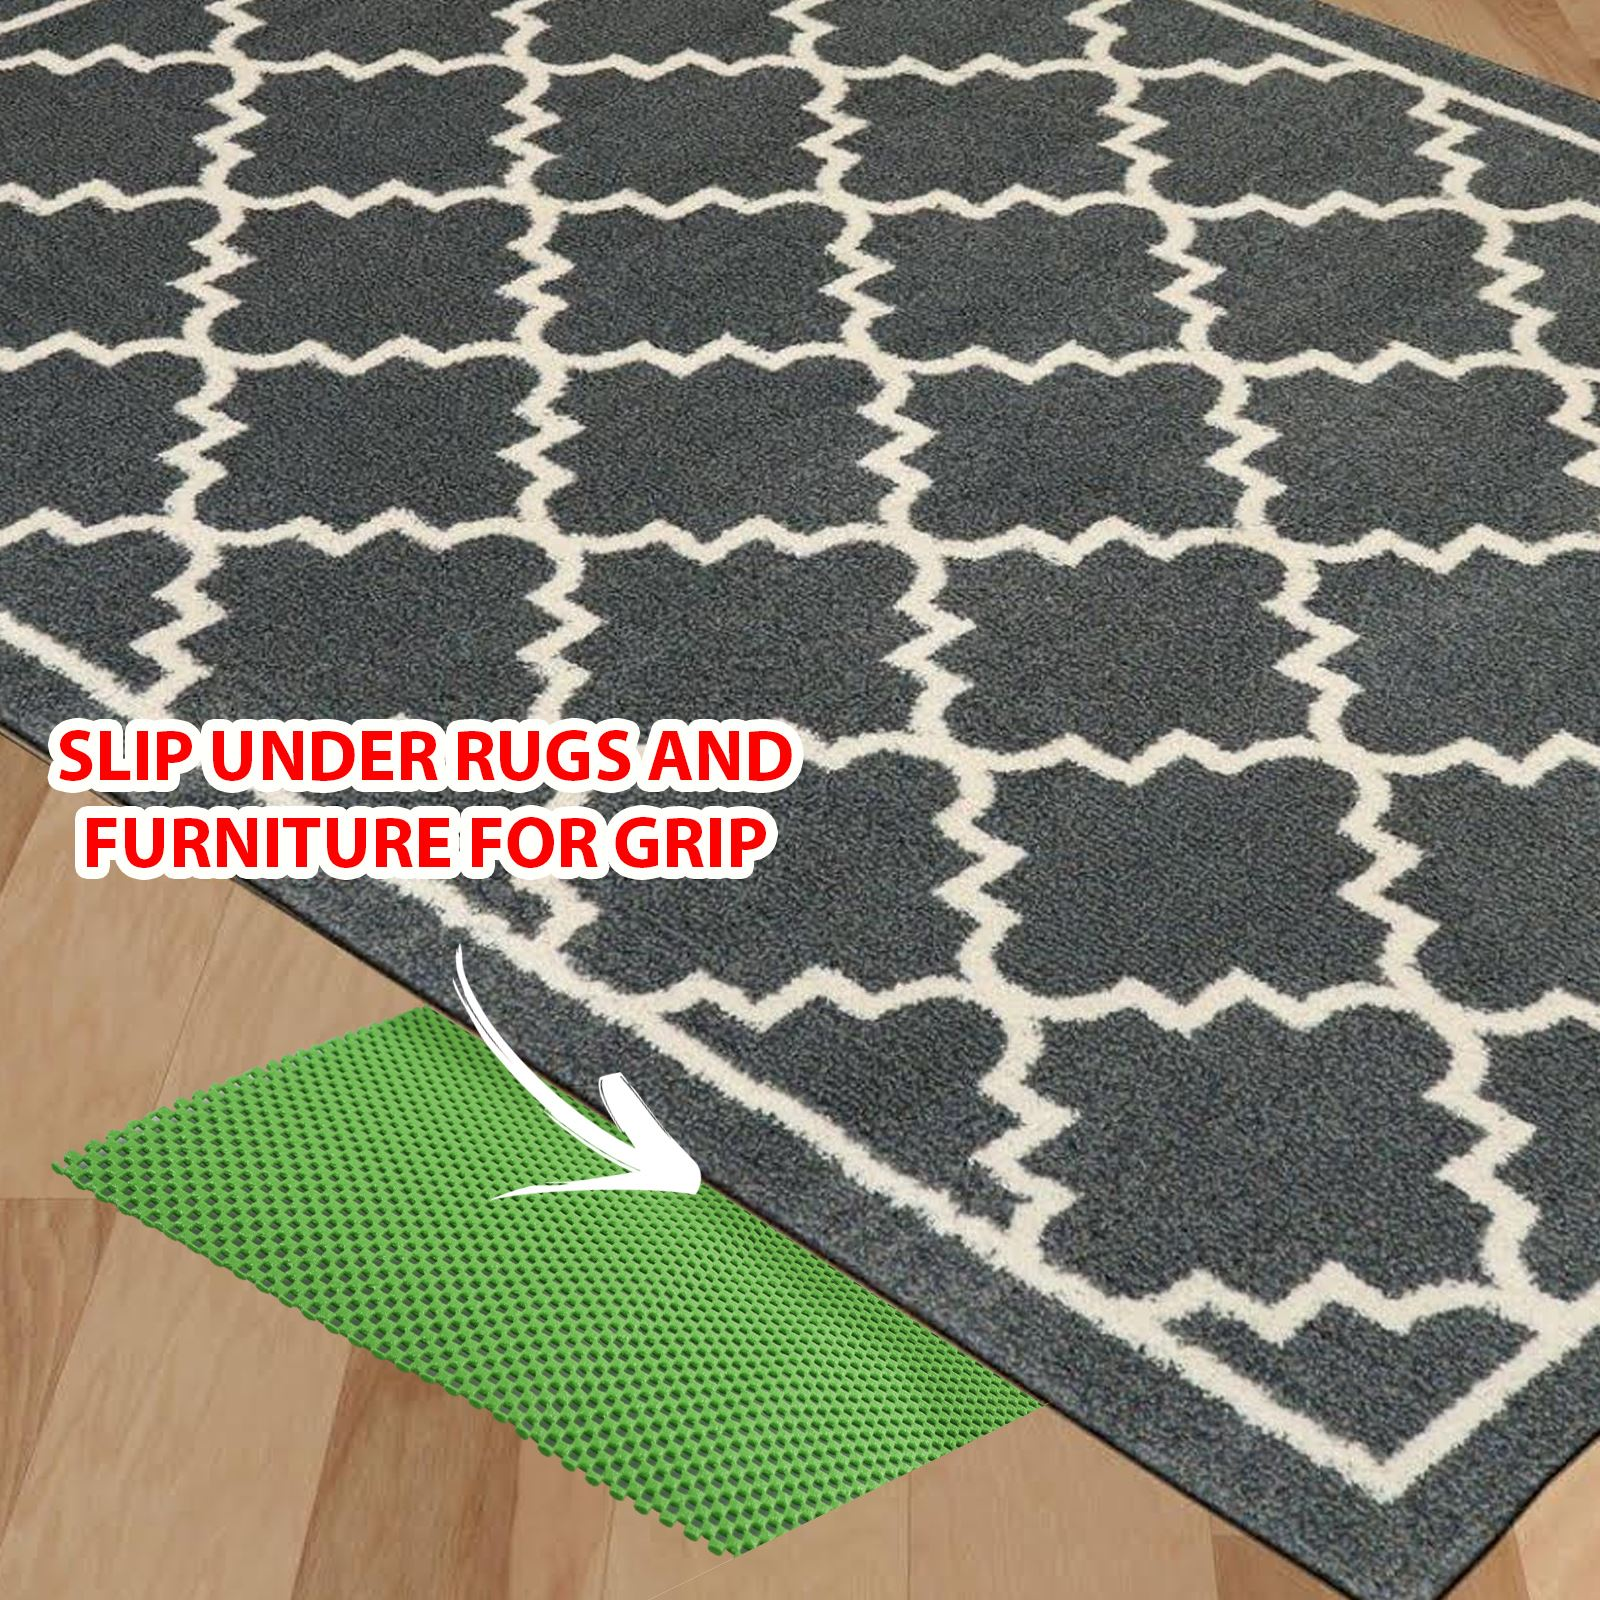 Multi-Purpose-Anti-Non-Slip-Rubber-Mat-Drawer-Liner-Flooring-Gripper-Carpet-Rug thumbnail 10